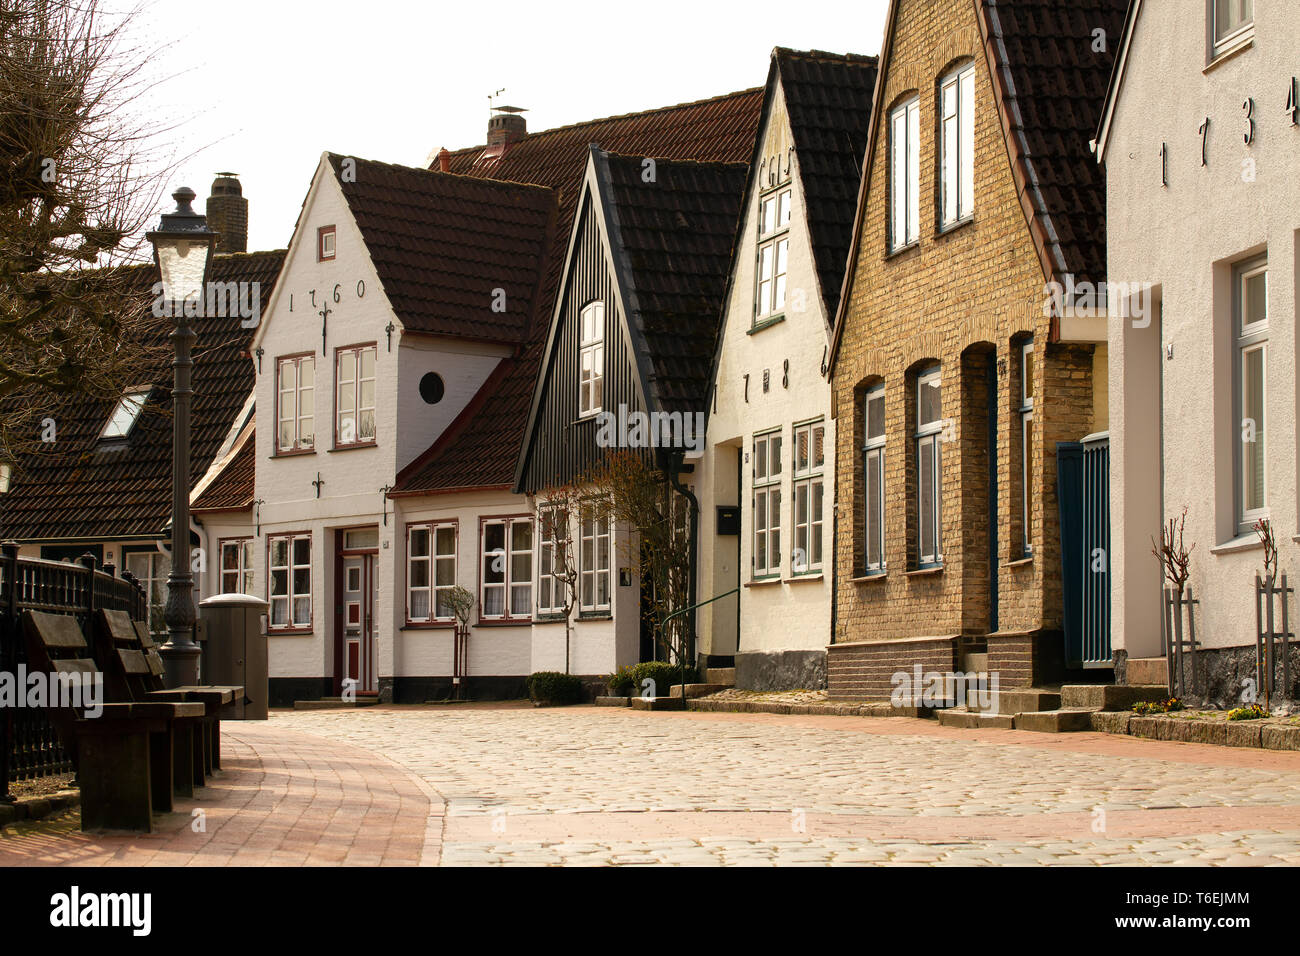 Schleswig Holm 001. Germany - Stock Image